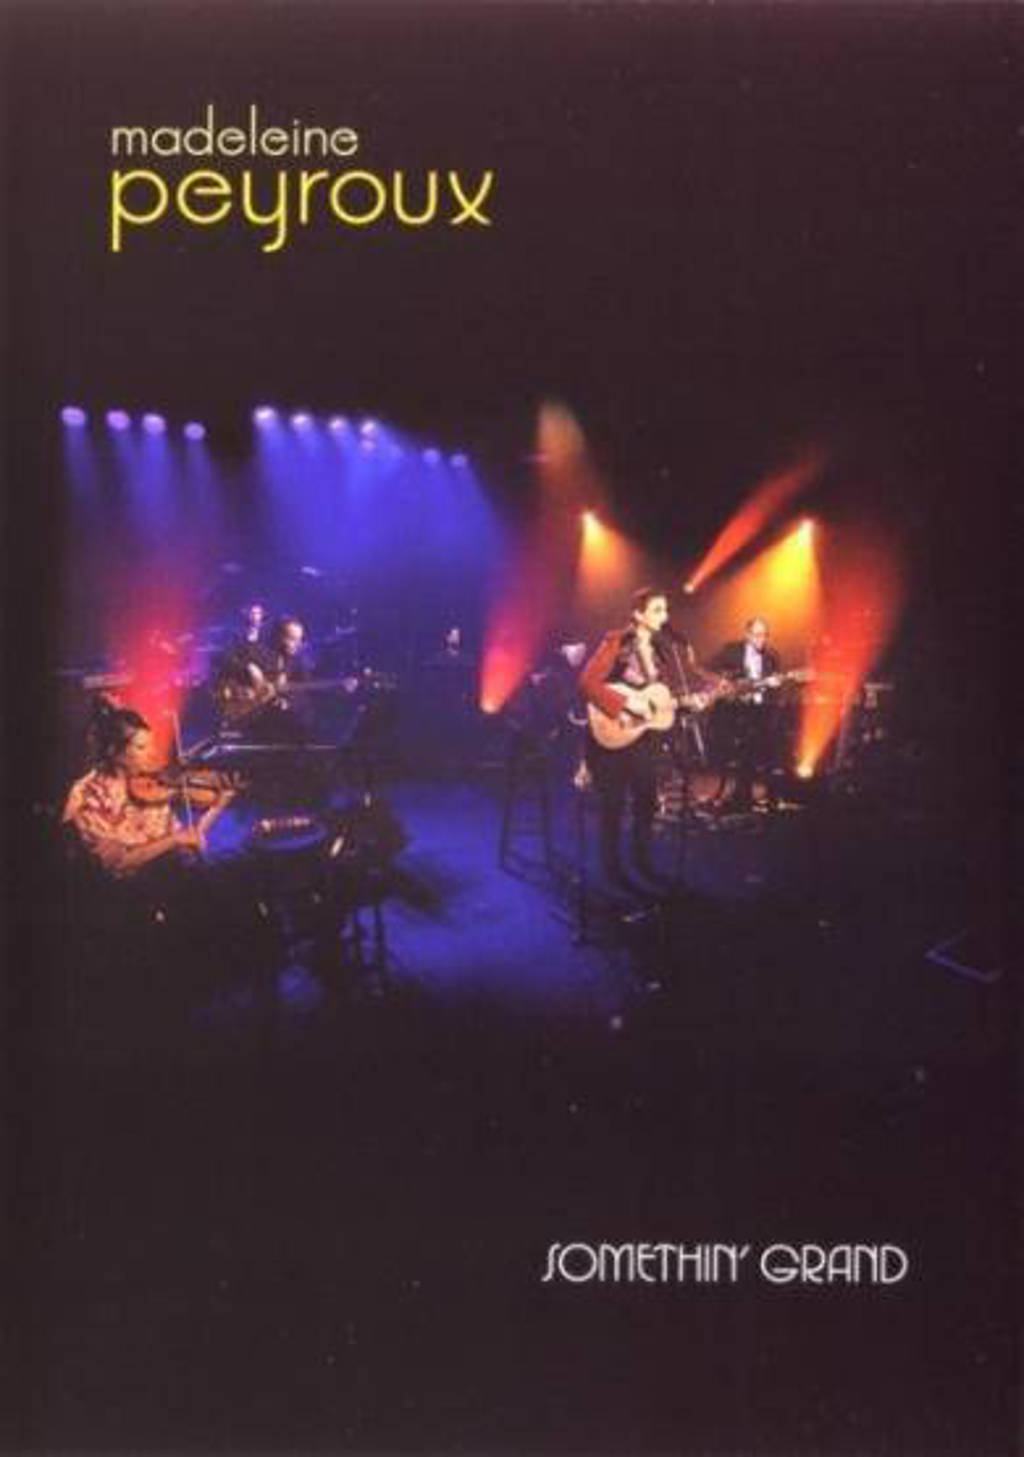 Madeleine Peyroux - Somethin Grand (DVD)